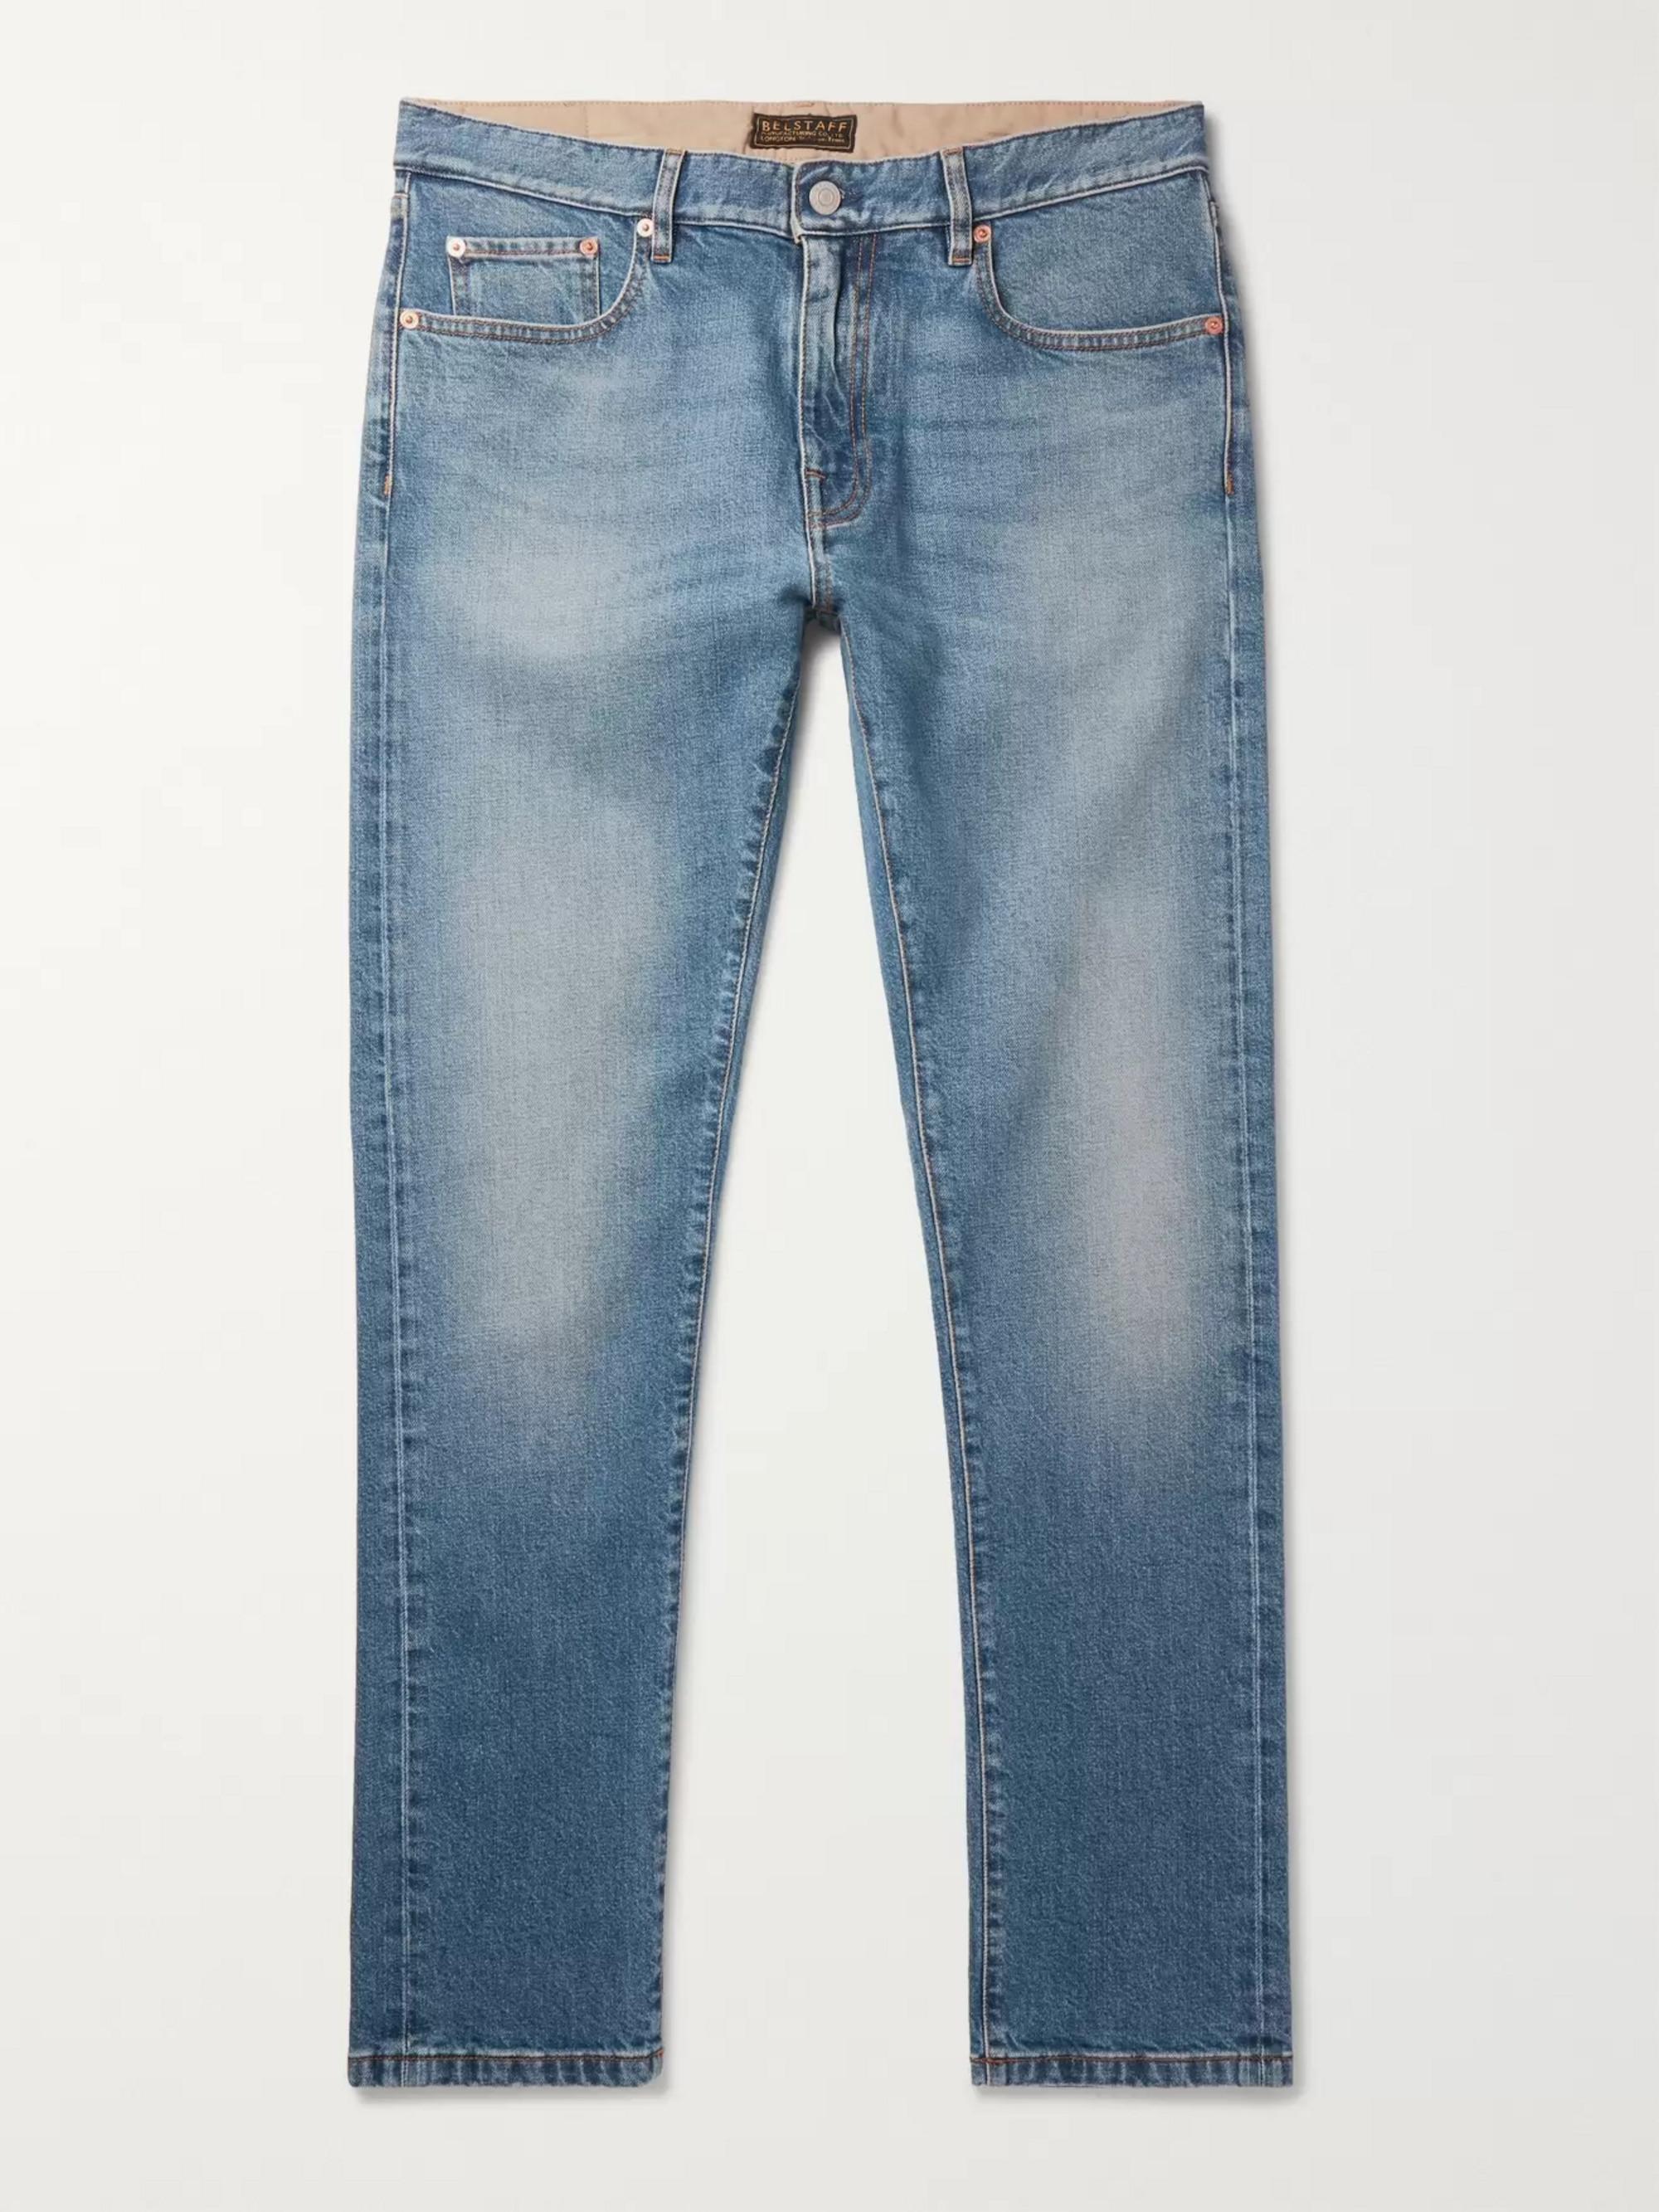 Longton Slim Fit Denim Jeans by Belstaff